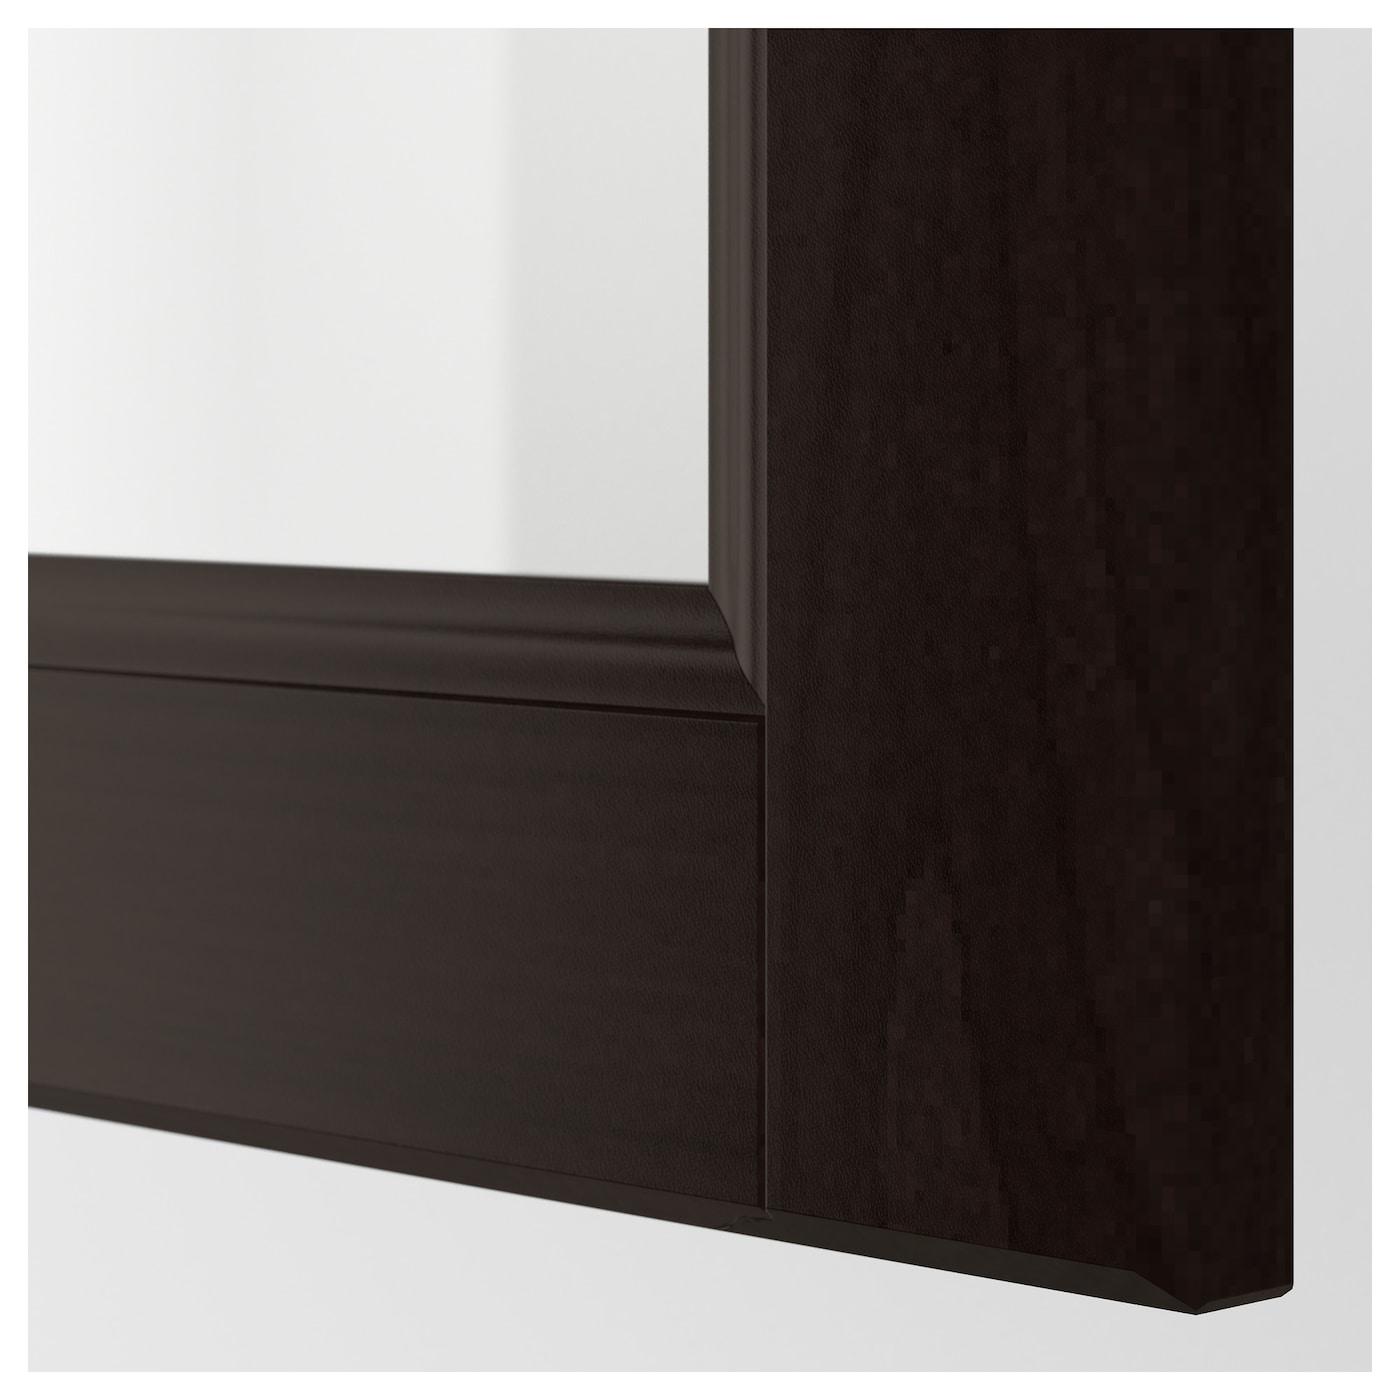 laxarby glass door black brown 40x80 cm ikea. Black Bedroom Furniture Sets. Home Design Ideas